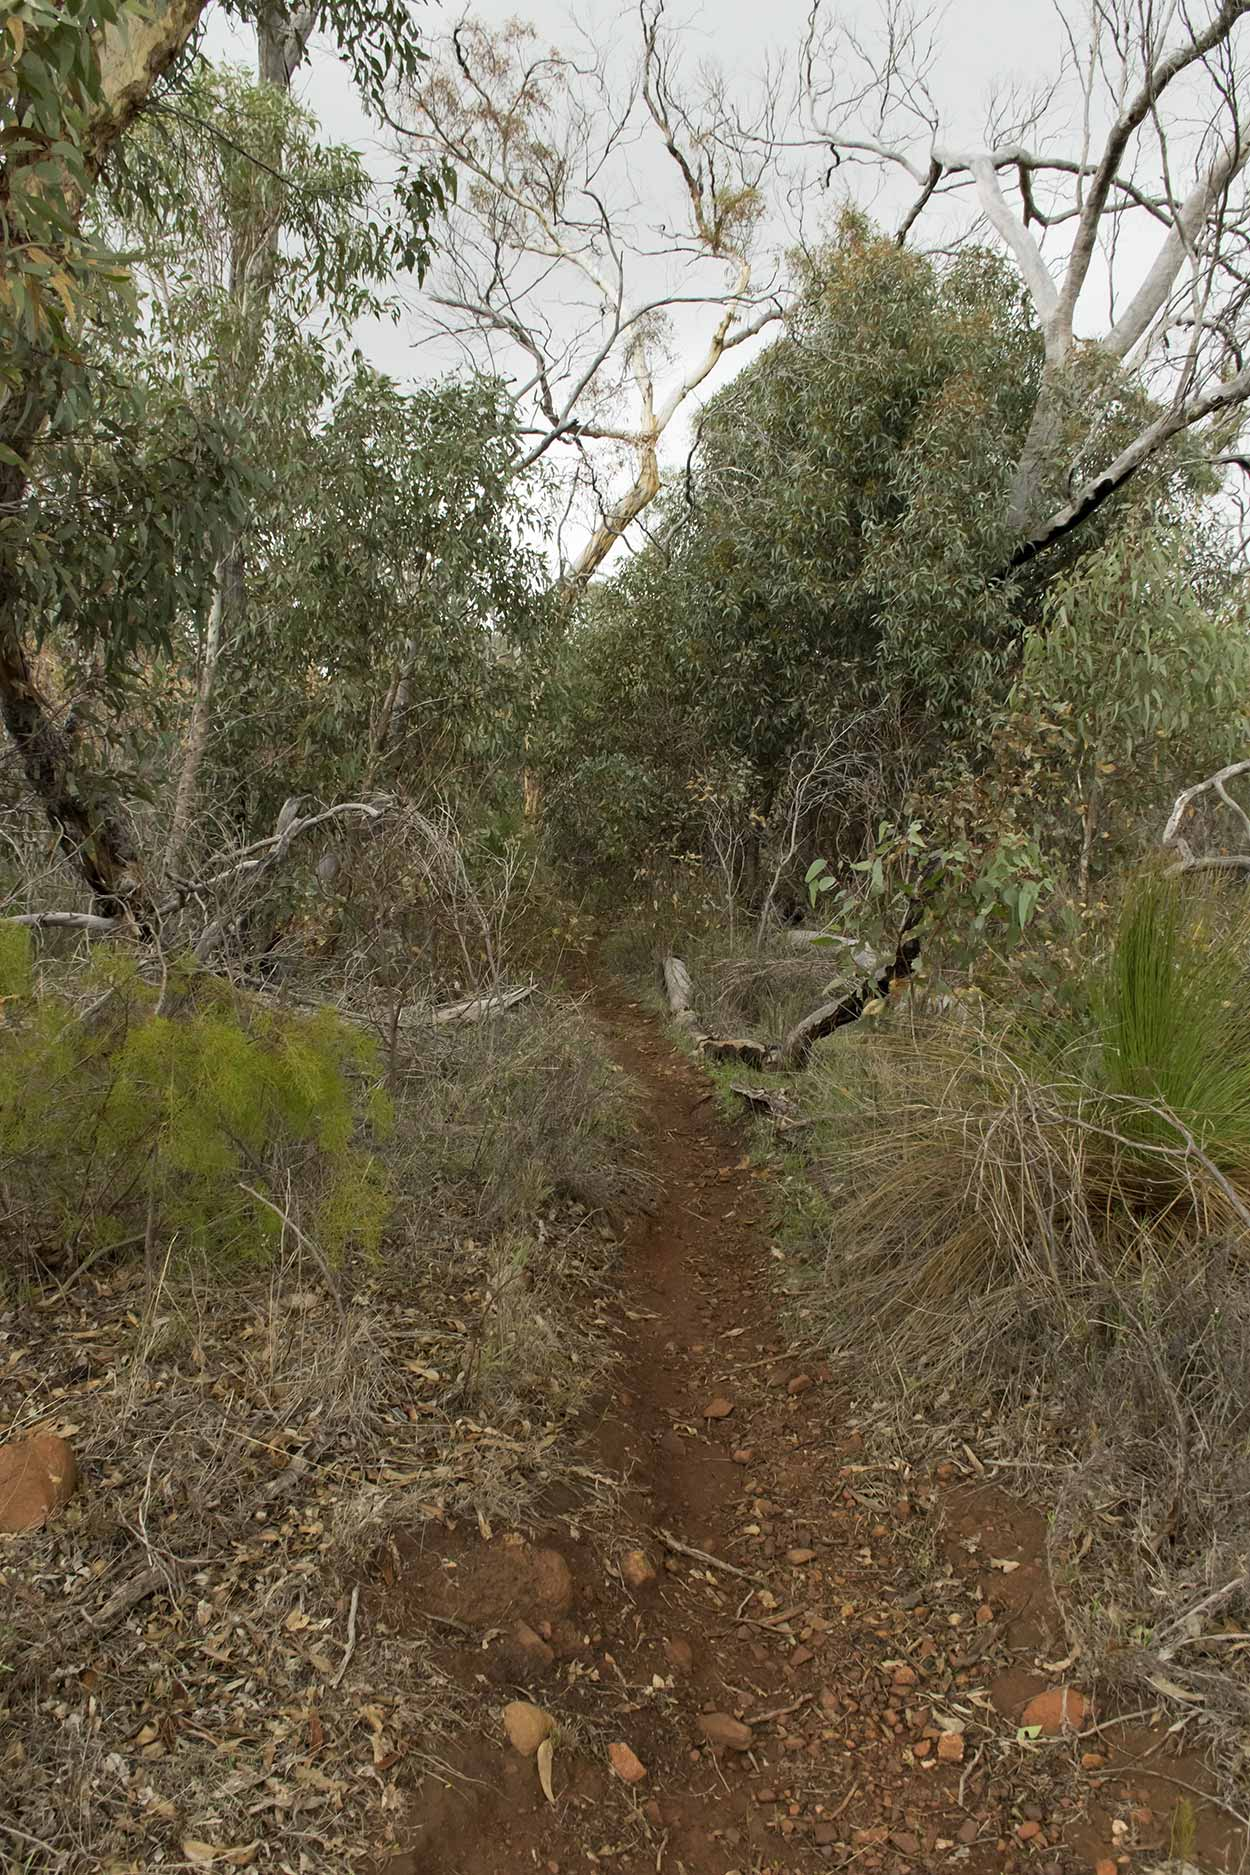 Walking in the scrub, Gooseberry Hill, Perth, Western Australia